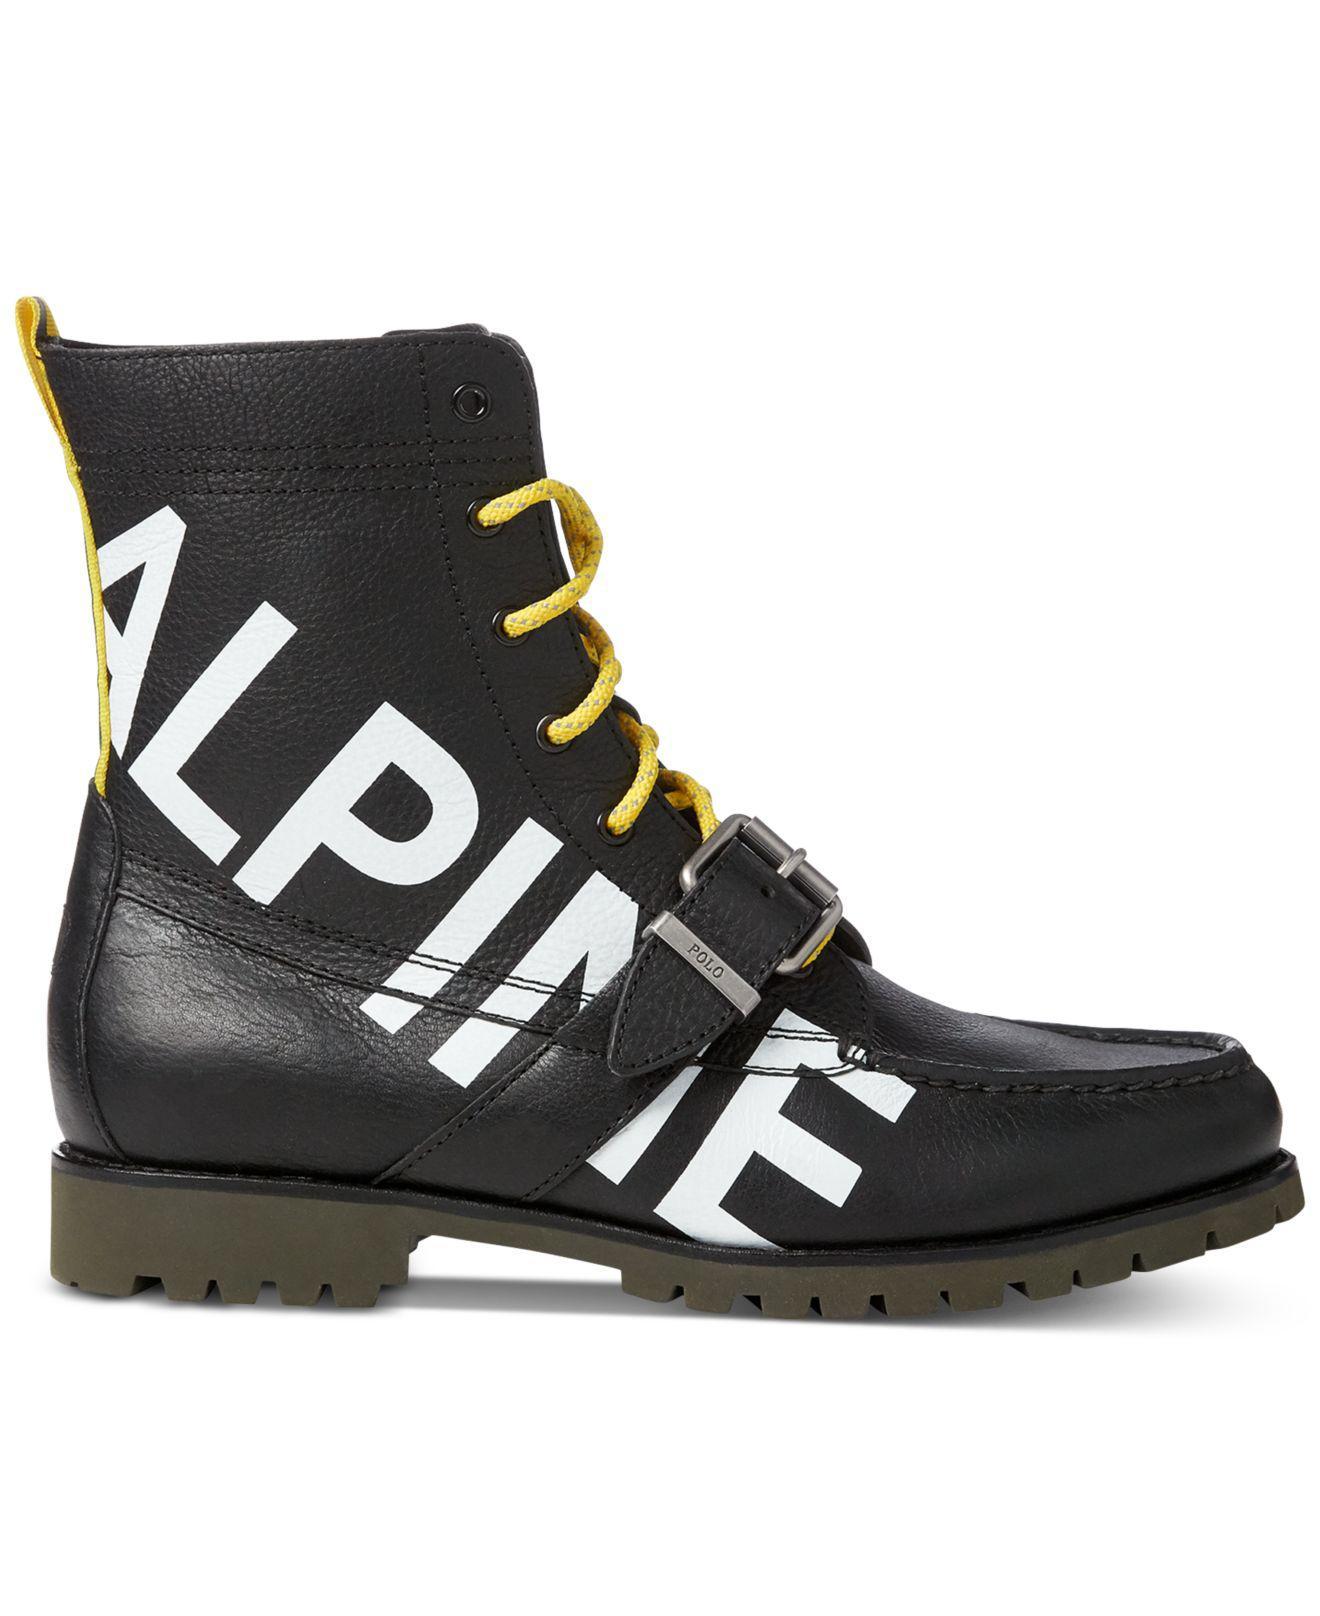 Polo Ralph Lauren Ranger Alpine Leather